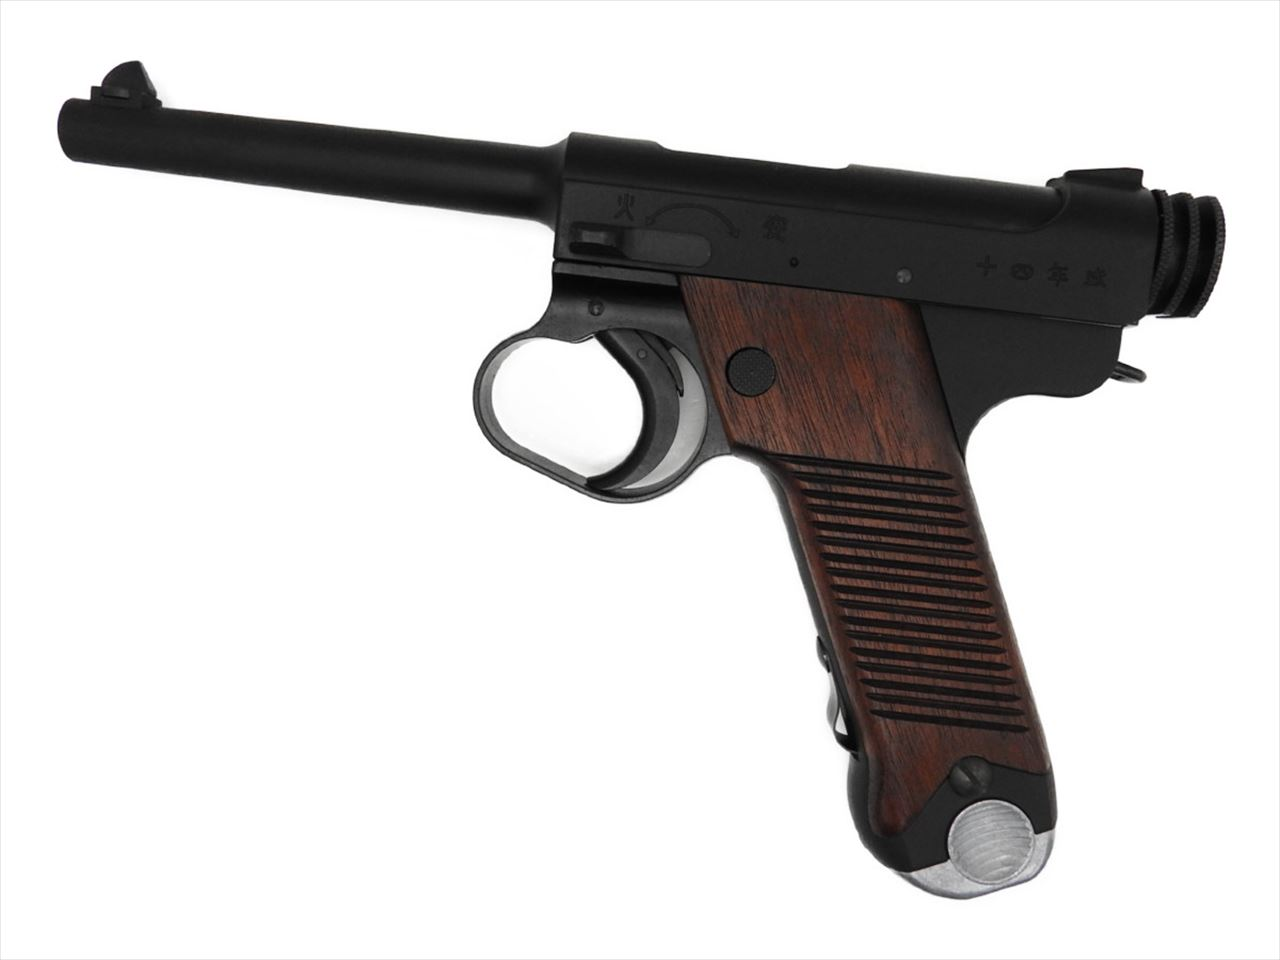 CAW 南部十四年式拳銃 後期型 木製グリップ付 14年式拳銃 ダミーカート式 日本陸軍省 モデルガン 新品 540049